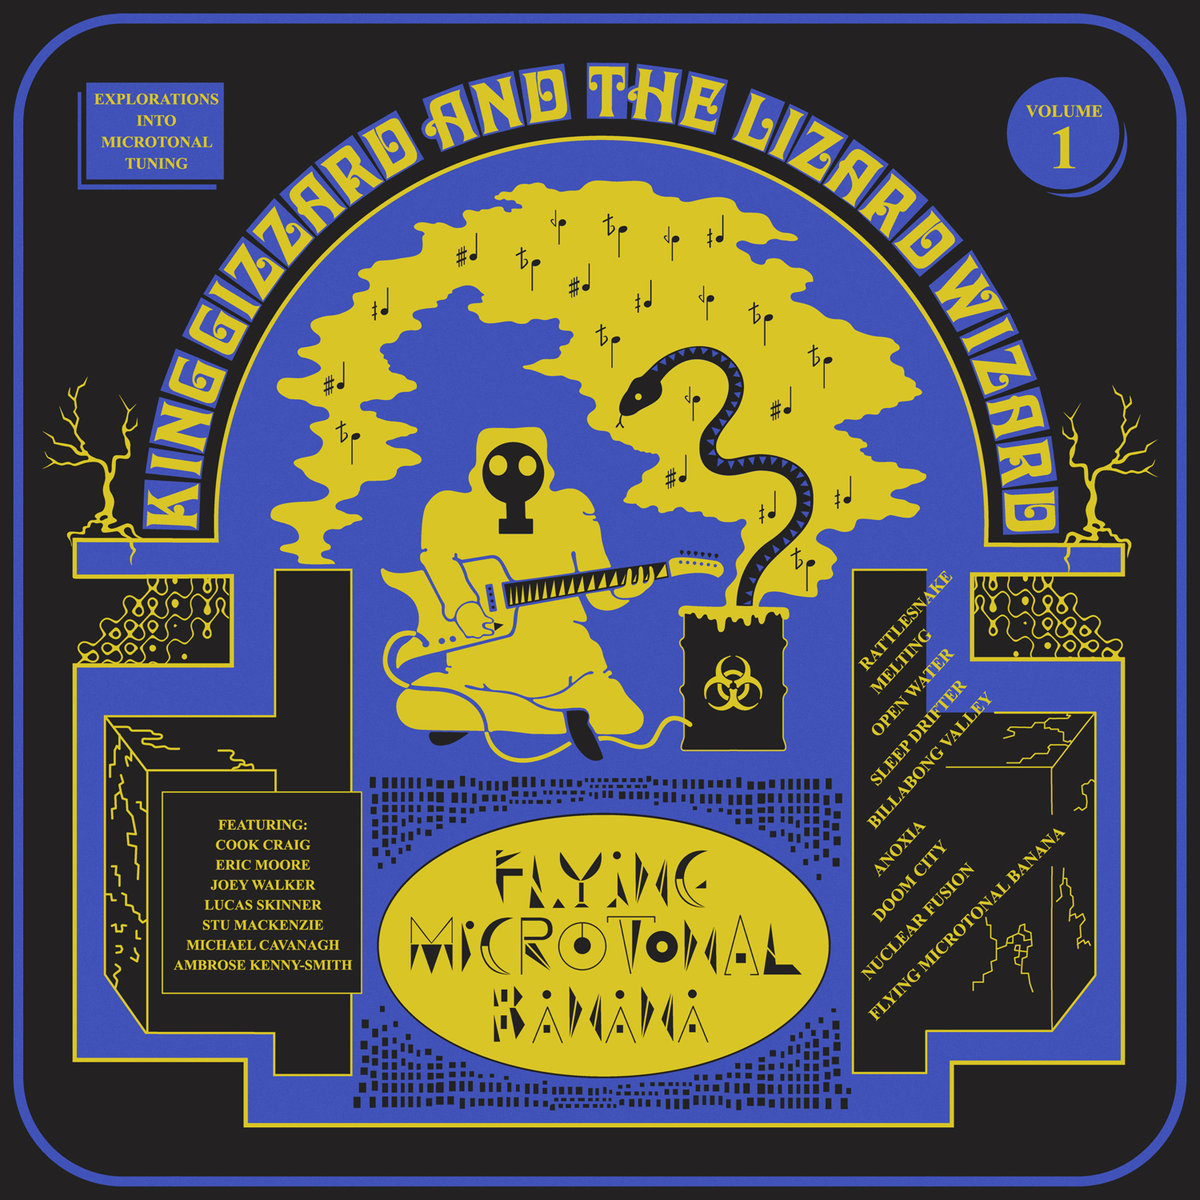 KING GIZZARD & THE WIZARD LIZARD – Flying Microtonal Banana